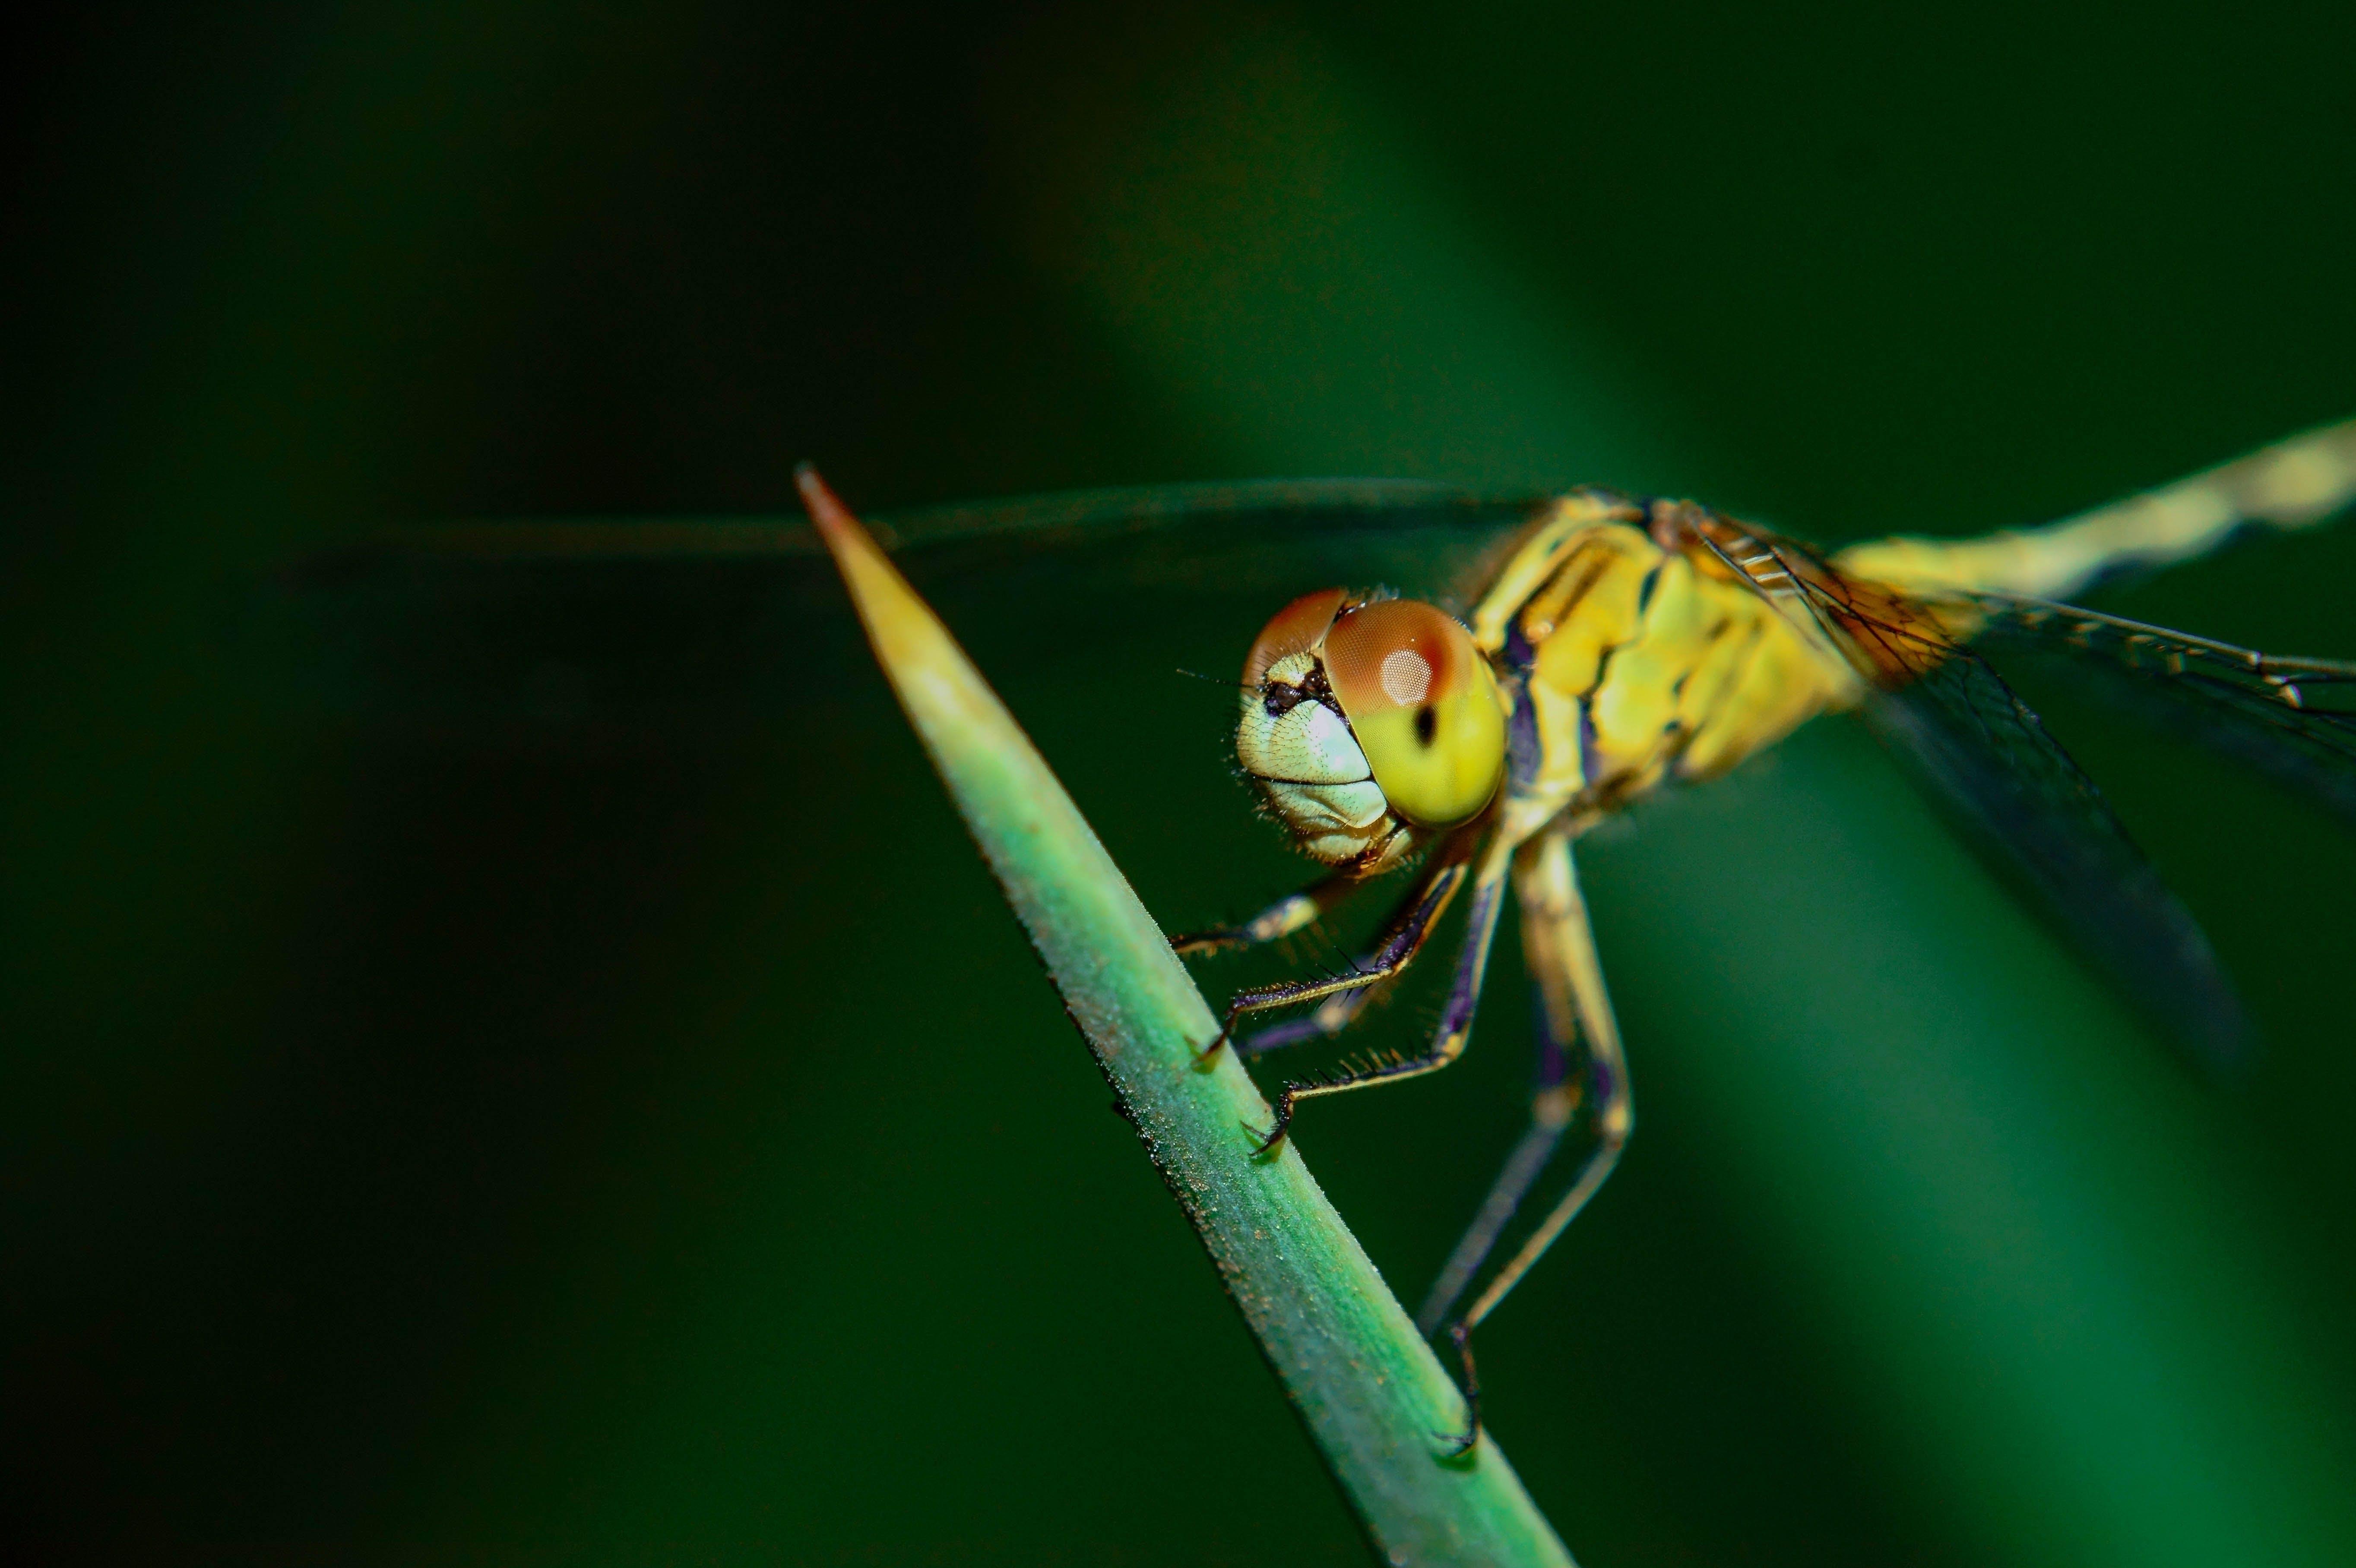 Free stock photo of #nature, #outdoorchallenge, #urban, #yellow